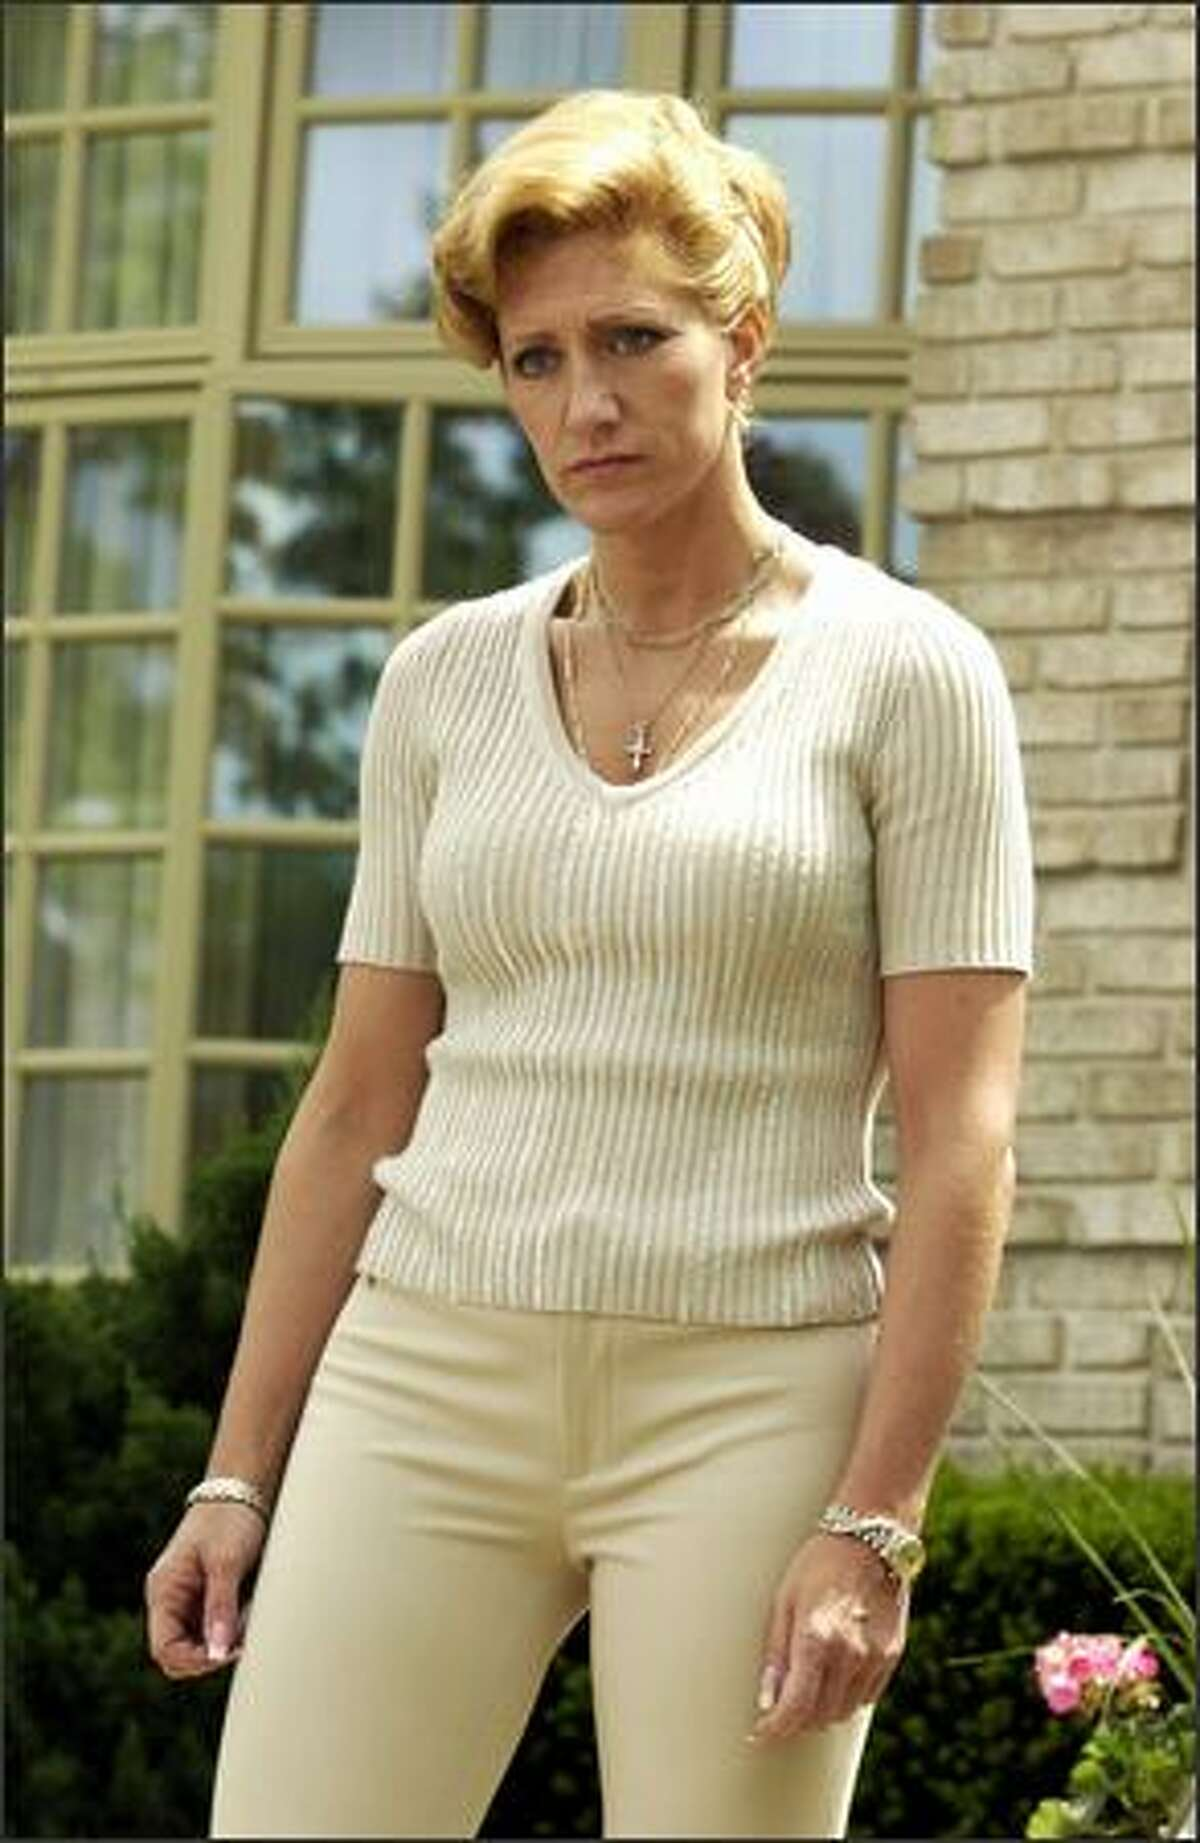 In the last season, Carmela Soprano (Edie Falco) decided that she wants a divorce from Tony (James Gandolfini).